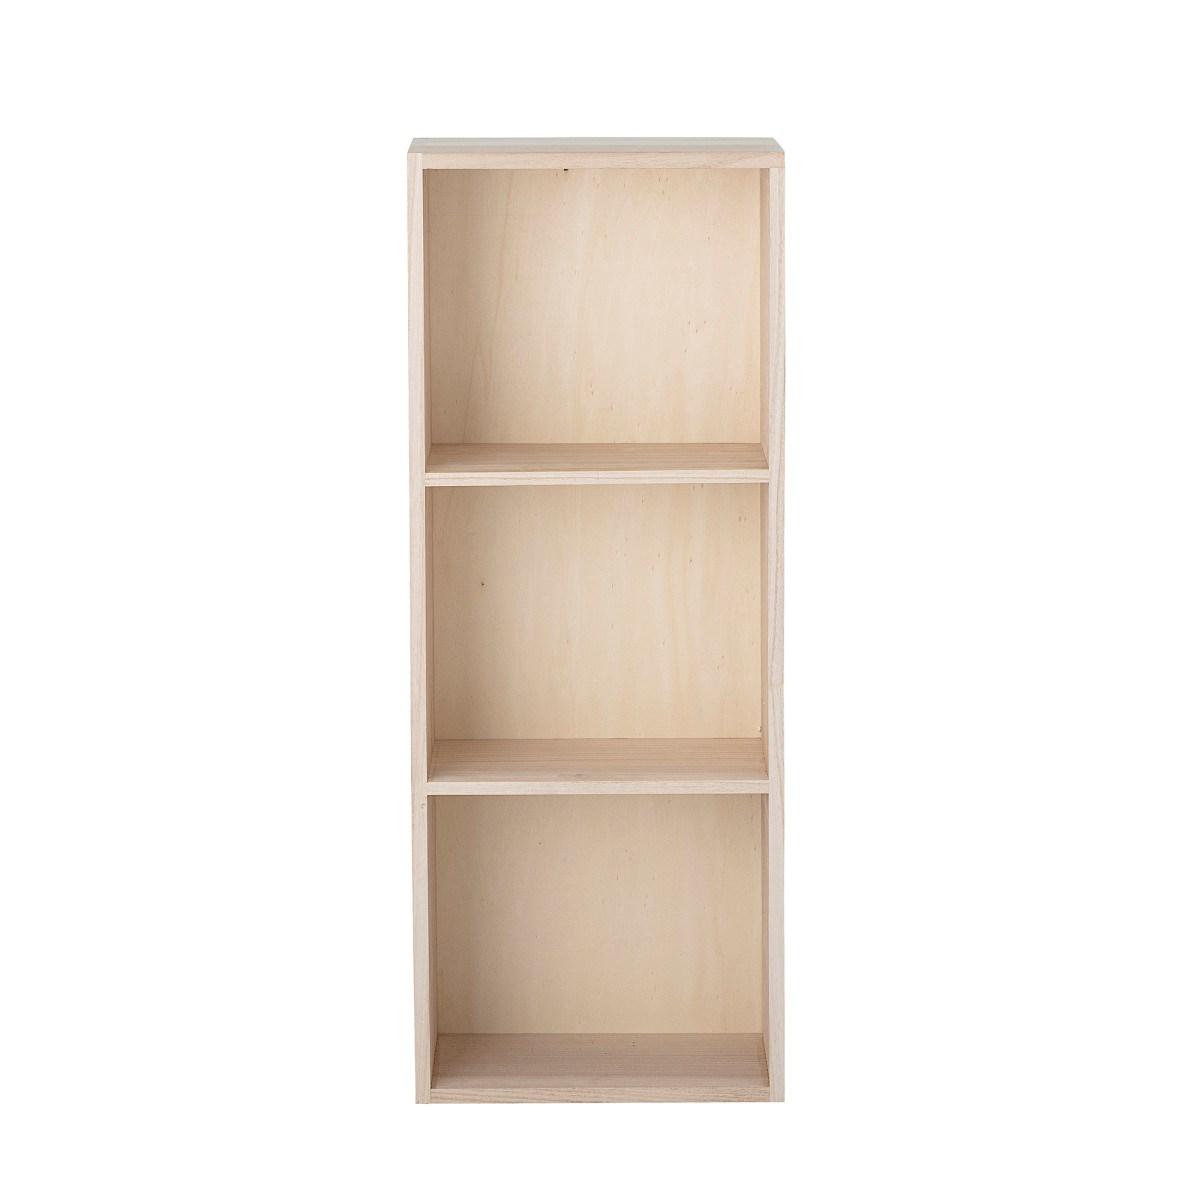 Dřevěná knihovna 91xV.50x35 cm_4